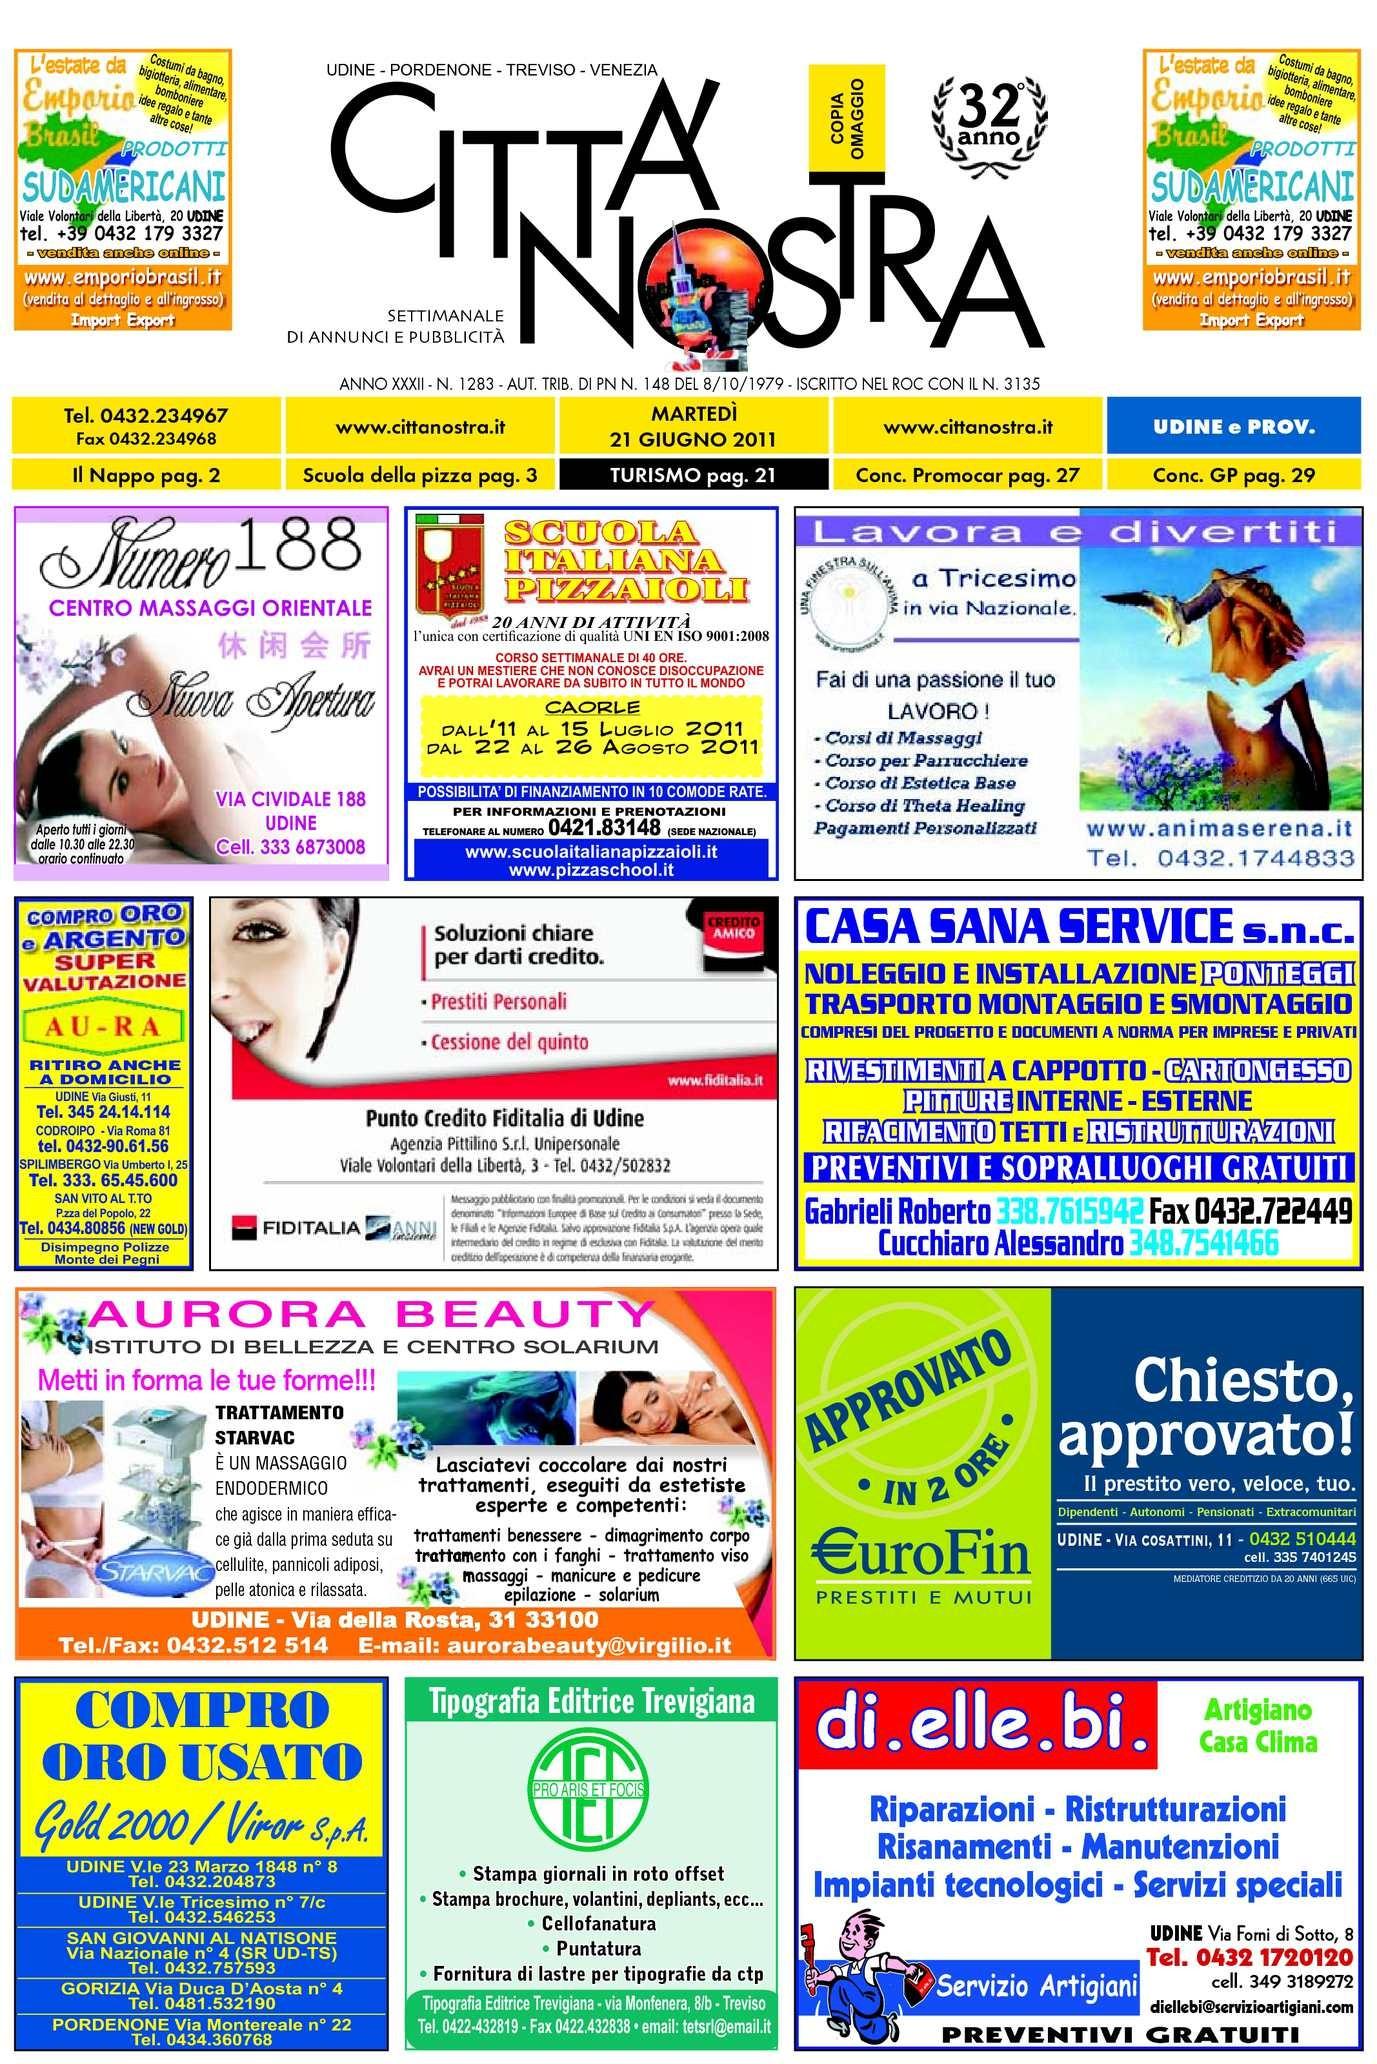 Calendario Annuale 2019 Con Festività Recientes Calaméo Citt Nostra Udine Del 21 06 2011 N 1283 Of Calendario Annuale 2019 Con Festività Más Caliente Home Page